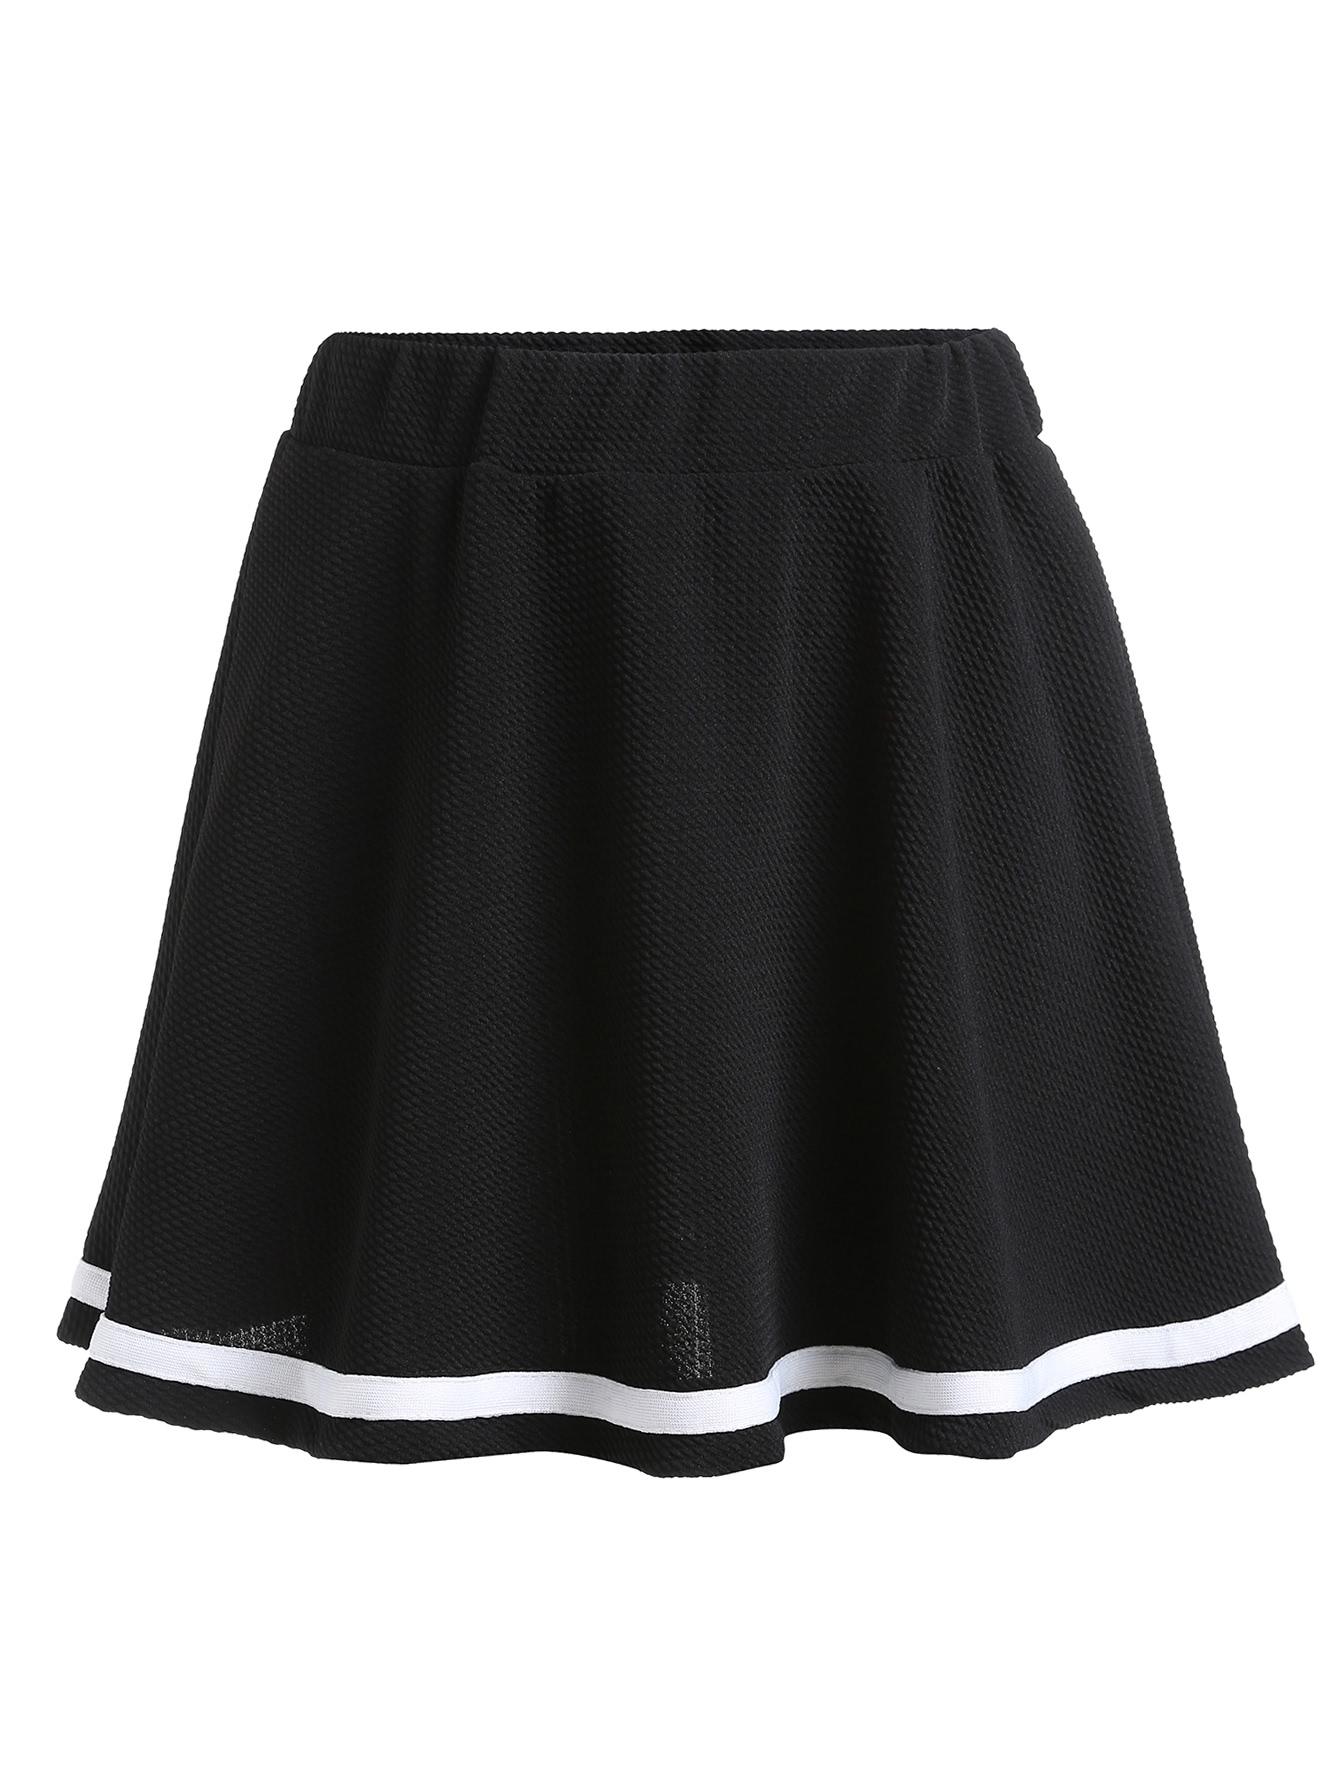 Black Contrast Tape Hem Elastic Waist A Line Skirt